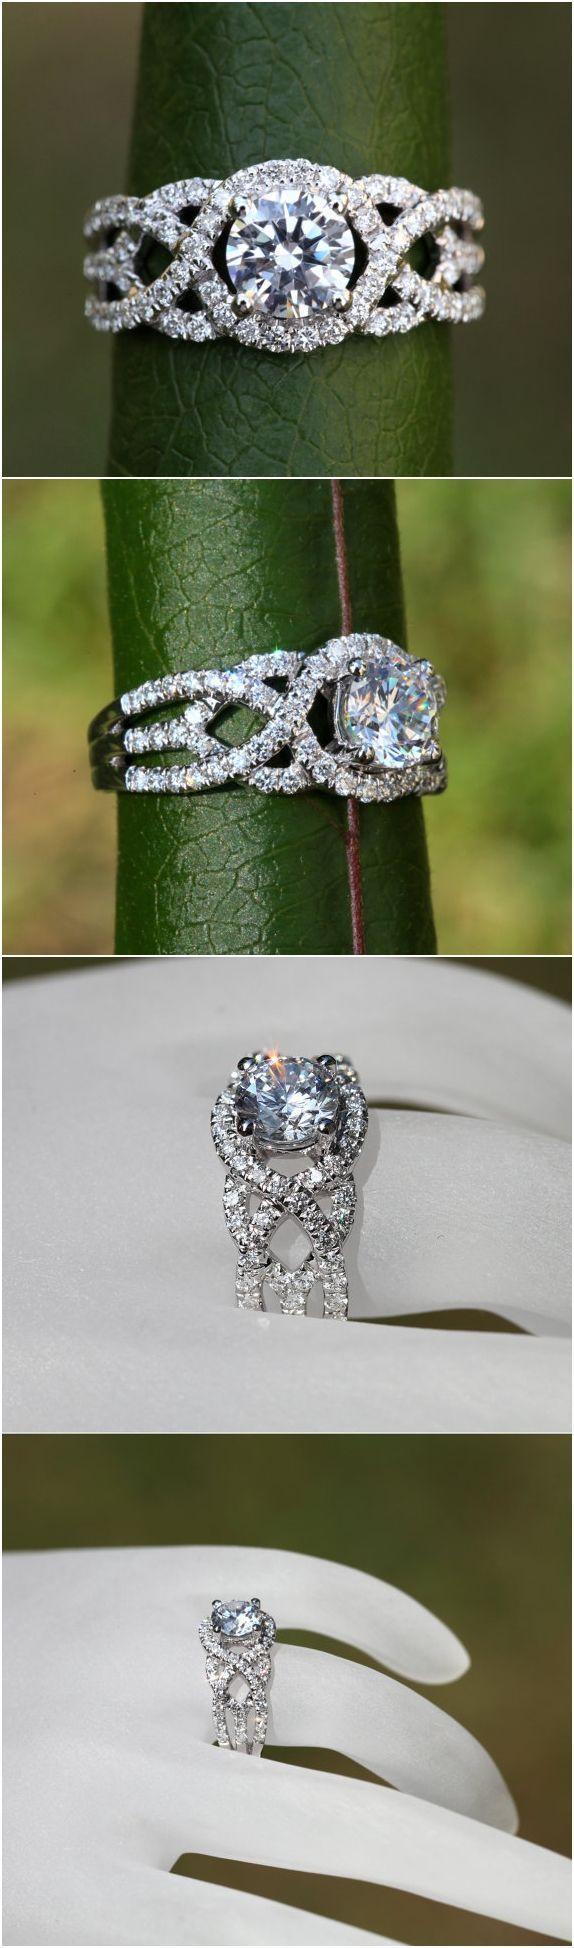 TWIST OF FATE - BeautifulPetra.com - .50 carat center Diamond Engagement Ring - 14k White gold - Halo - Unique - Swirl - Pave - Bp024 #haloring